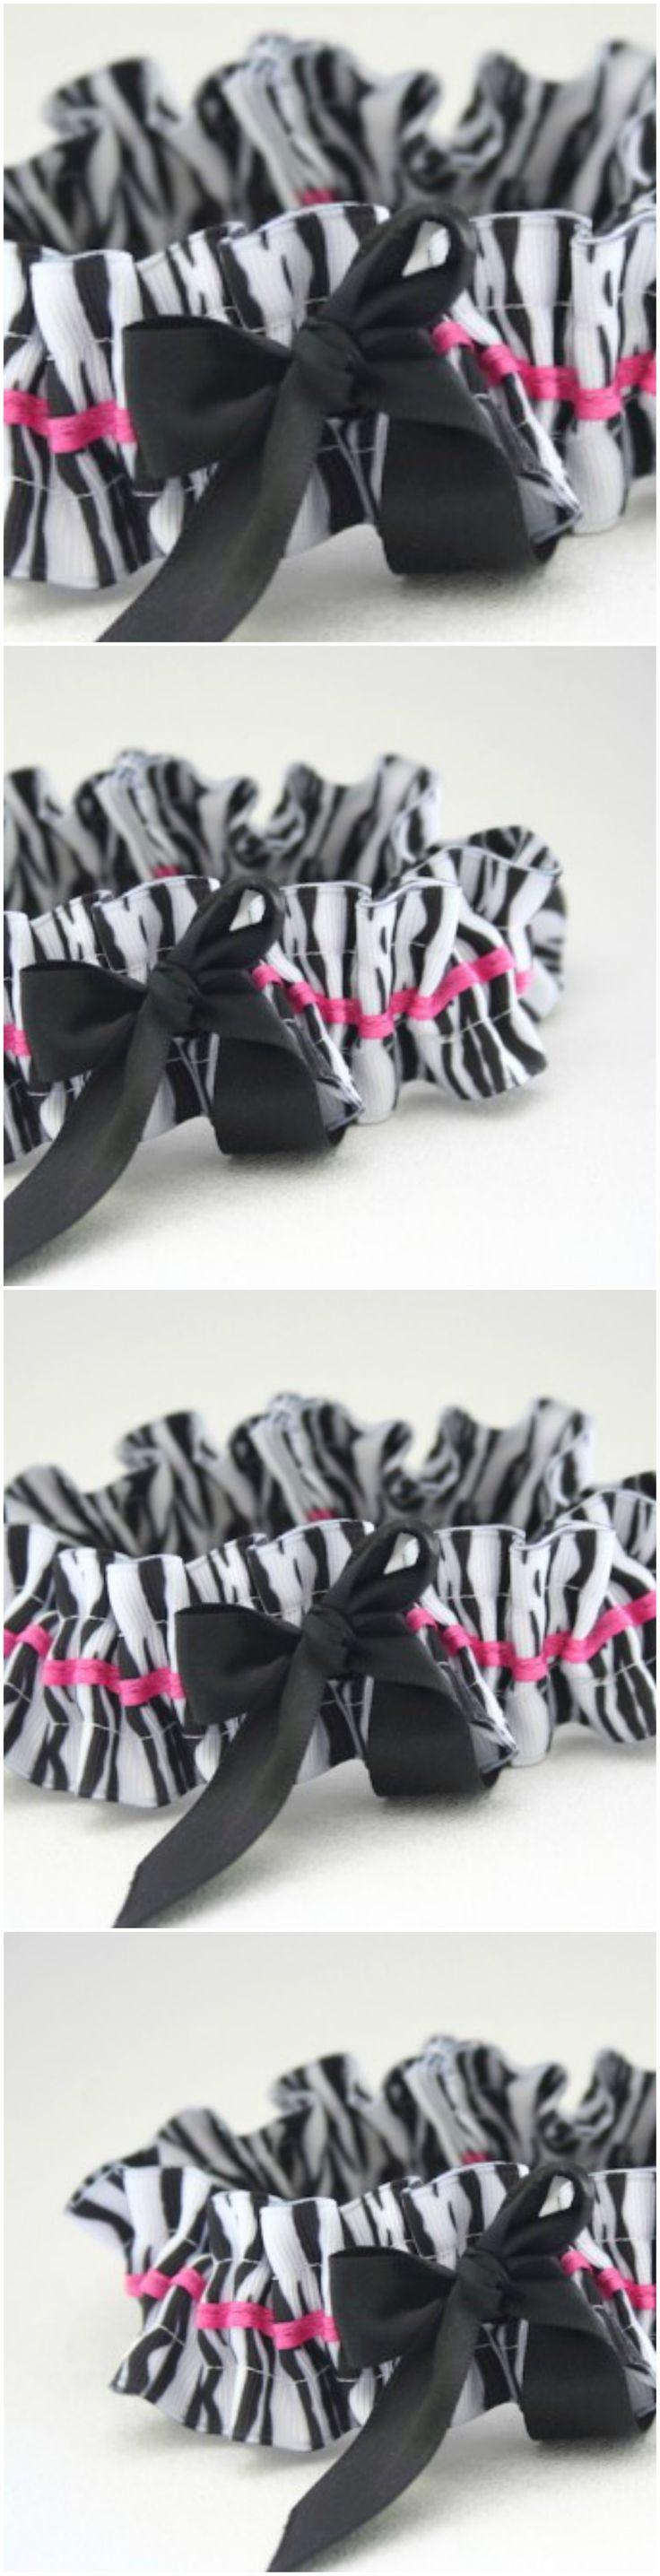 Custom Zebra and Hot pink wedding garter- by The Garter Girl